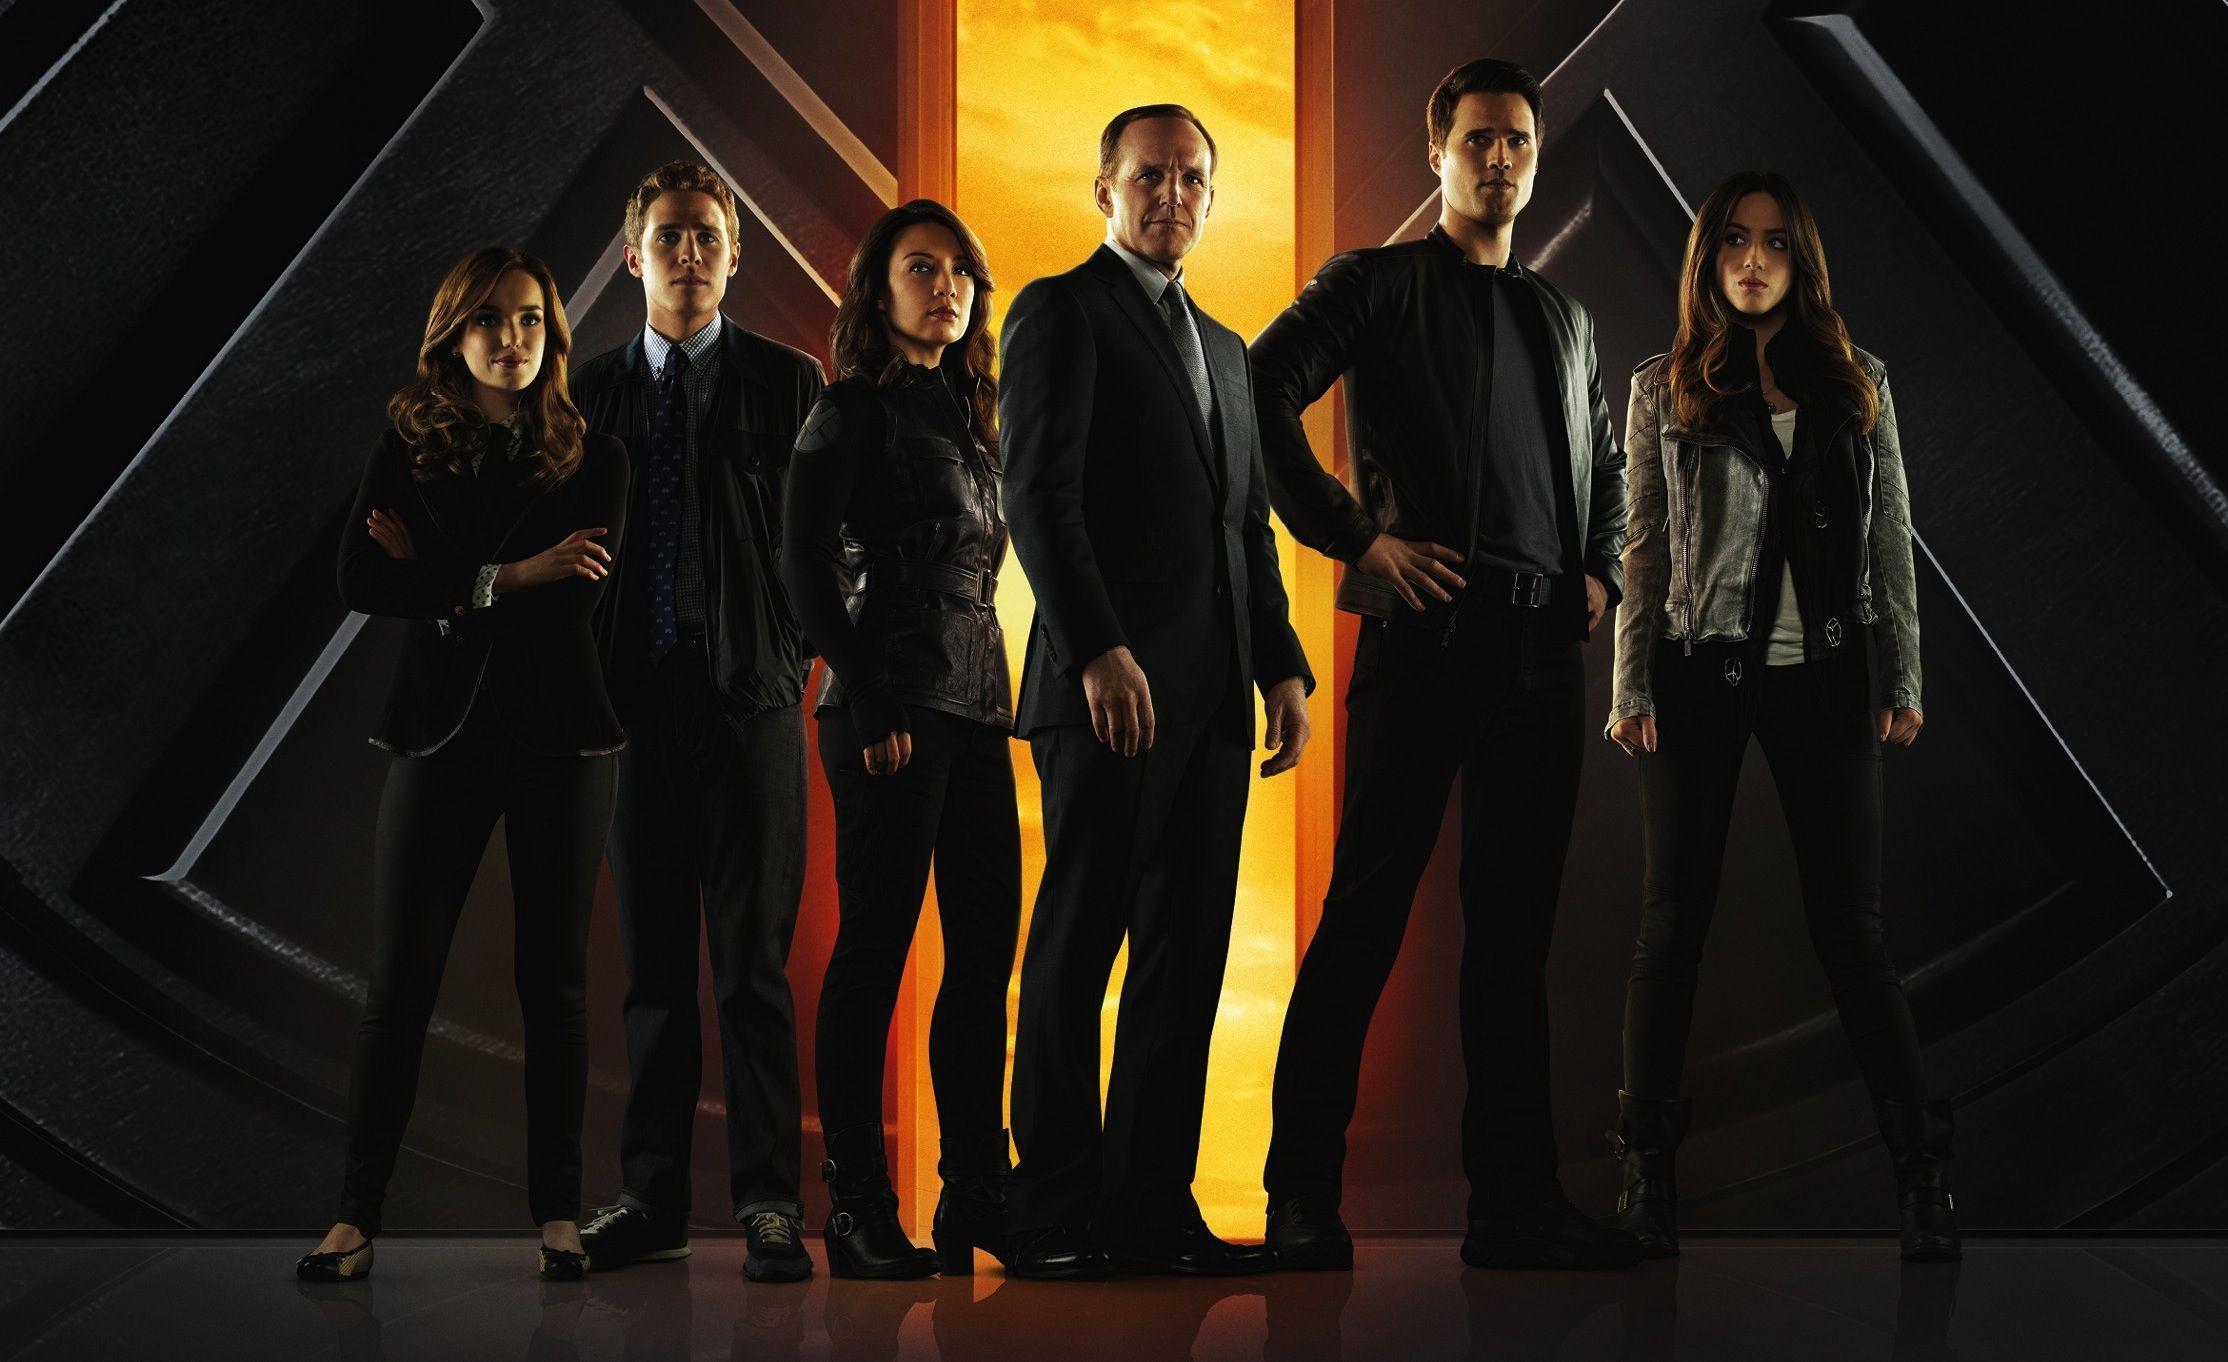 Agents Of S.H.I.E.L.D Teams Background 6